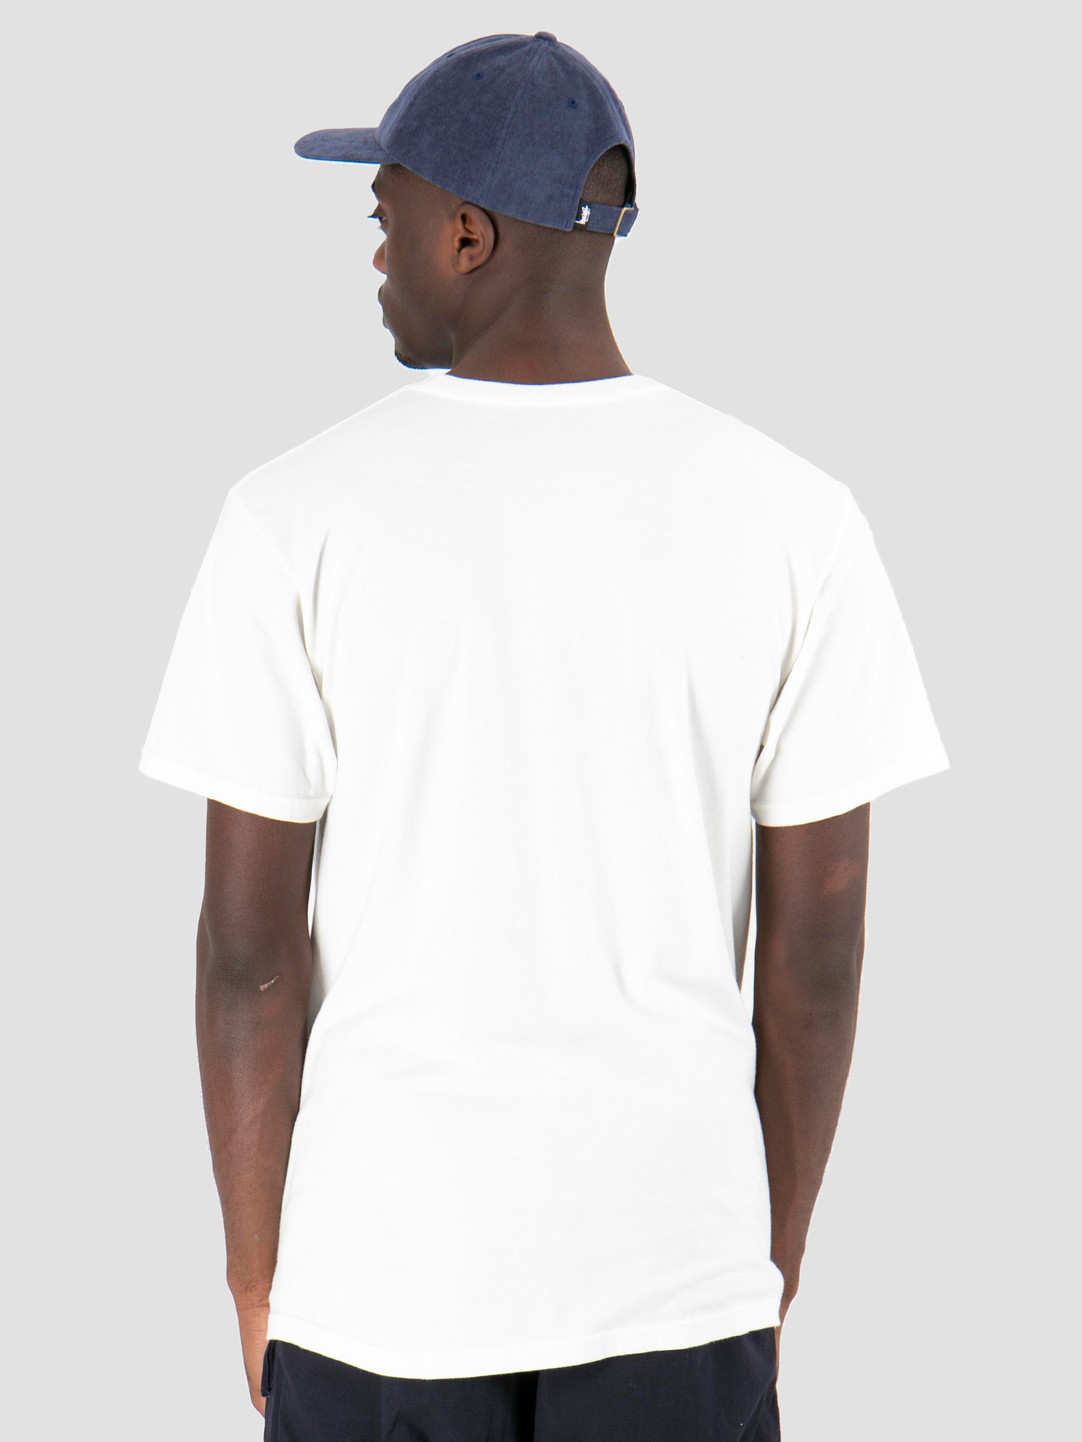 Stussy Stussy Stripes Pig Dyed T-Shirt Natural 1002